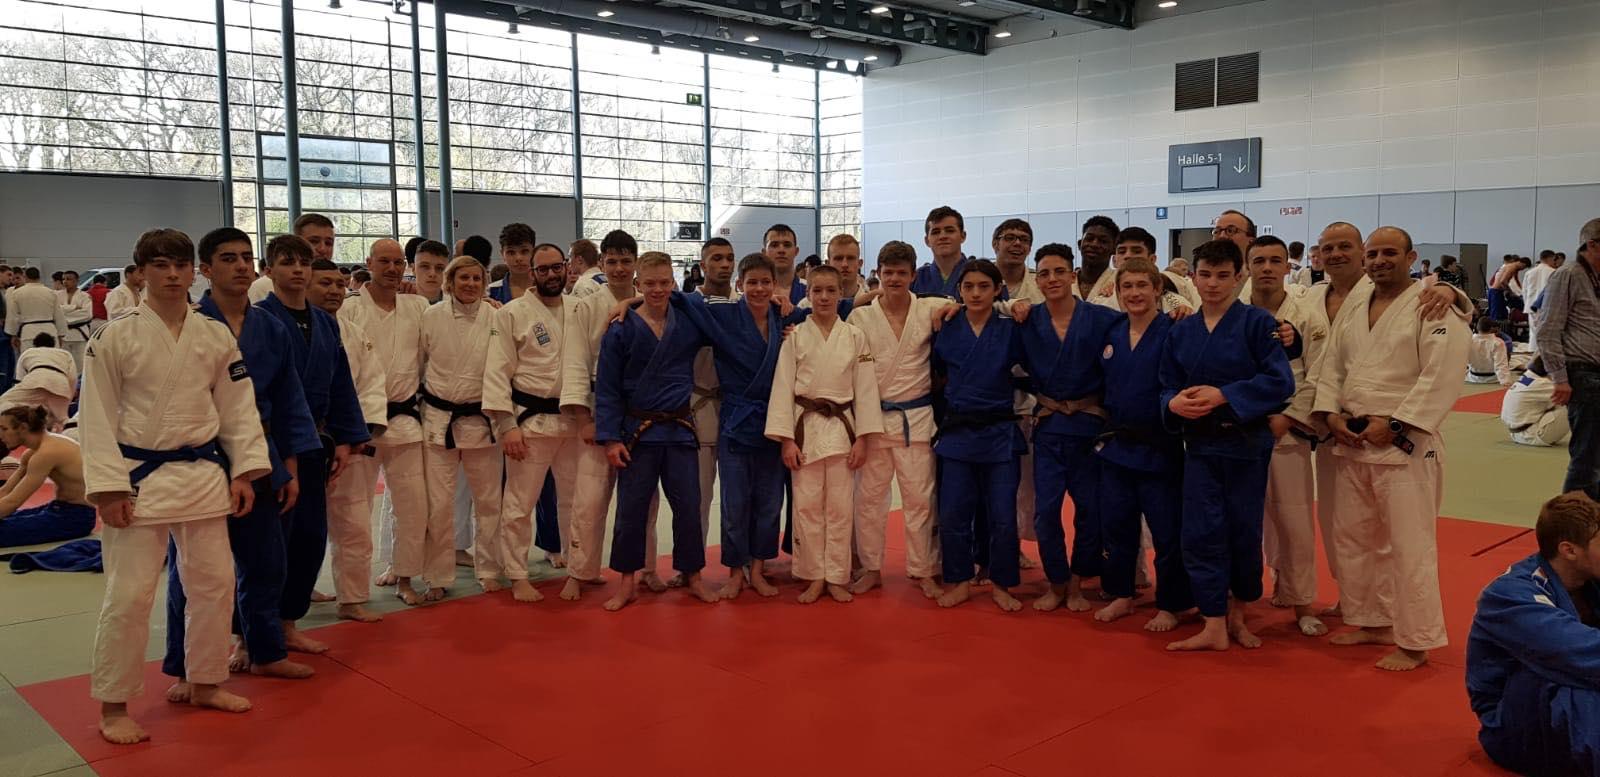 Interreg Judo Team - Training Camps Bremen & Bad Blankenburg 2019